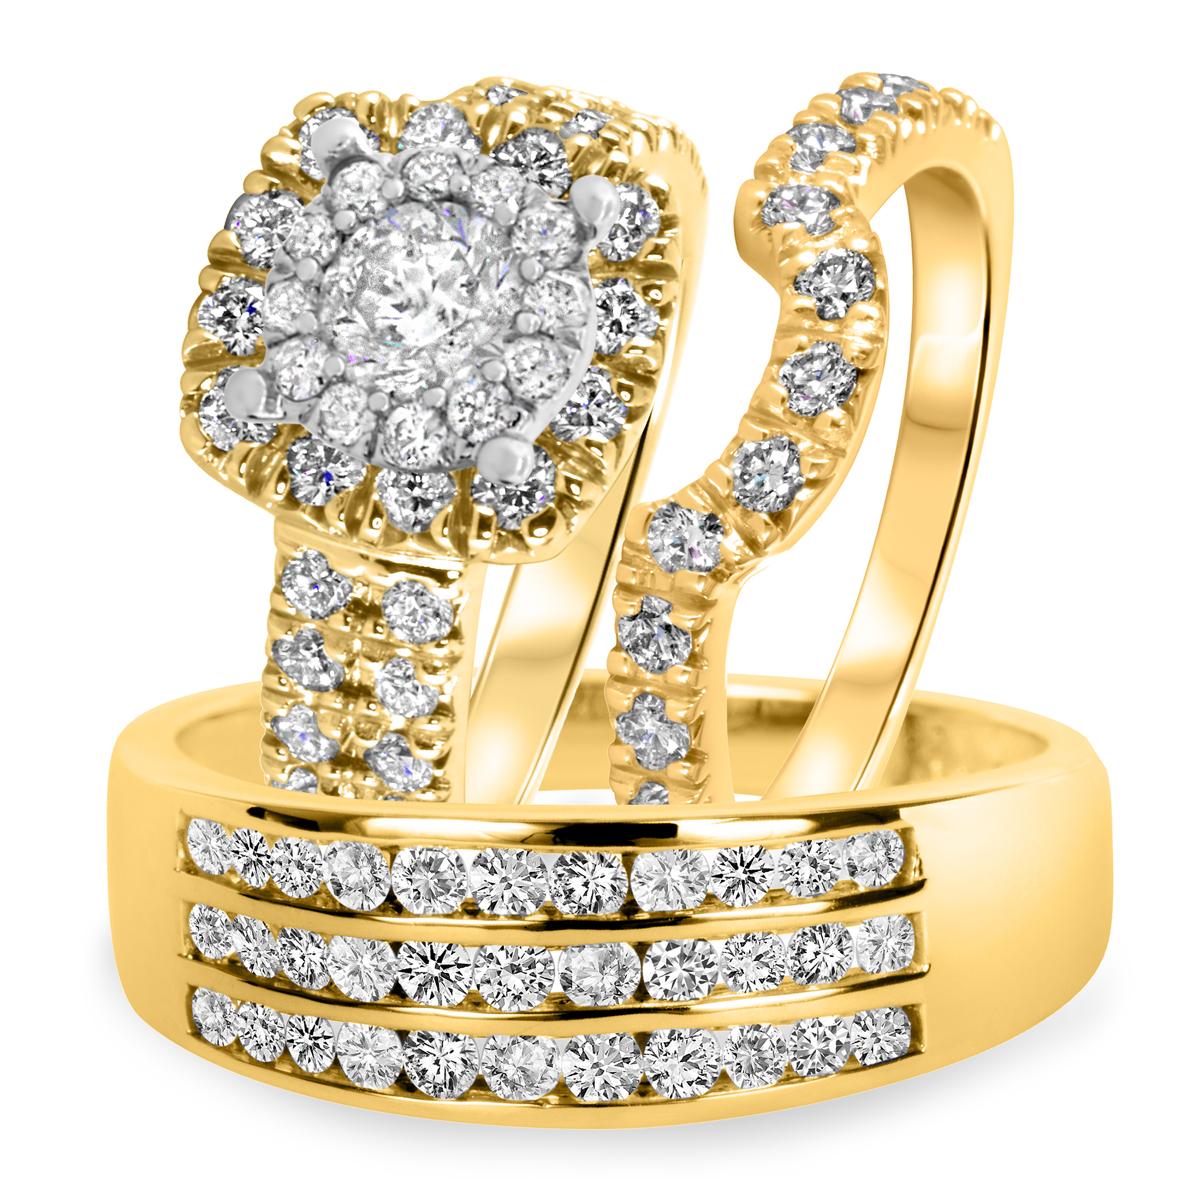 2 1/2 CT. T.W. Diamond Ladies Engagement Ring, Wedding Band, Men's Wedding Band